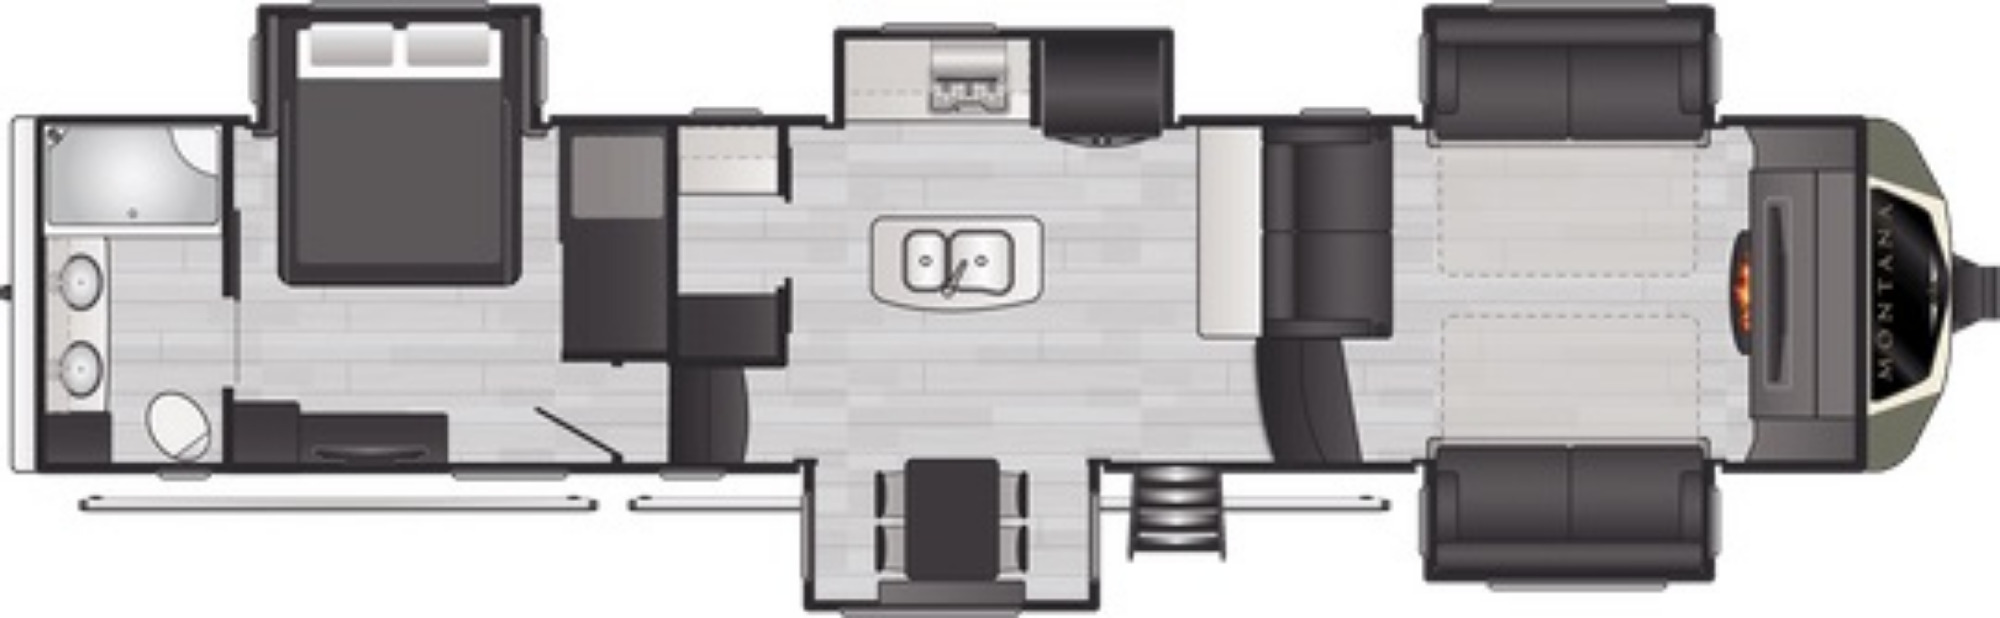 View Floor Plan for 2021 KEYSTONE MONTANA 3762BP